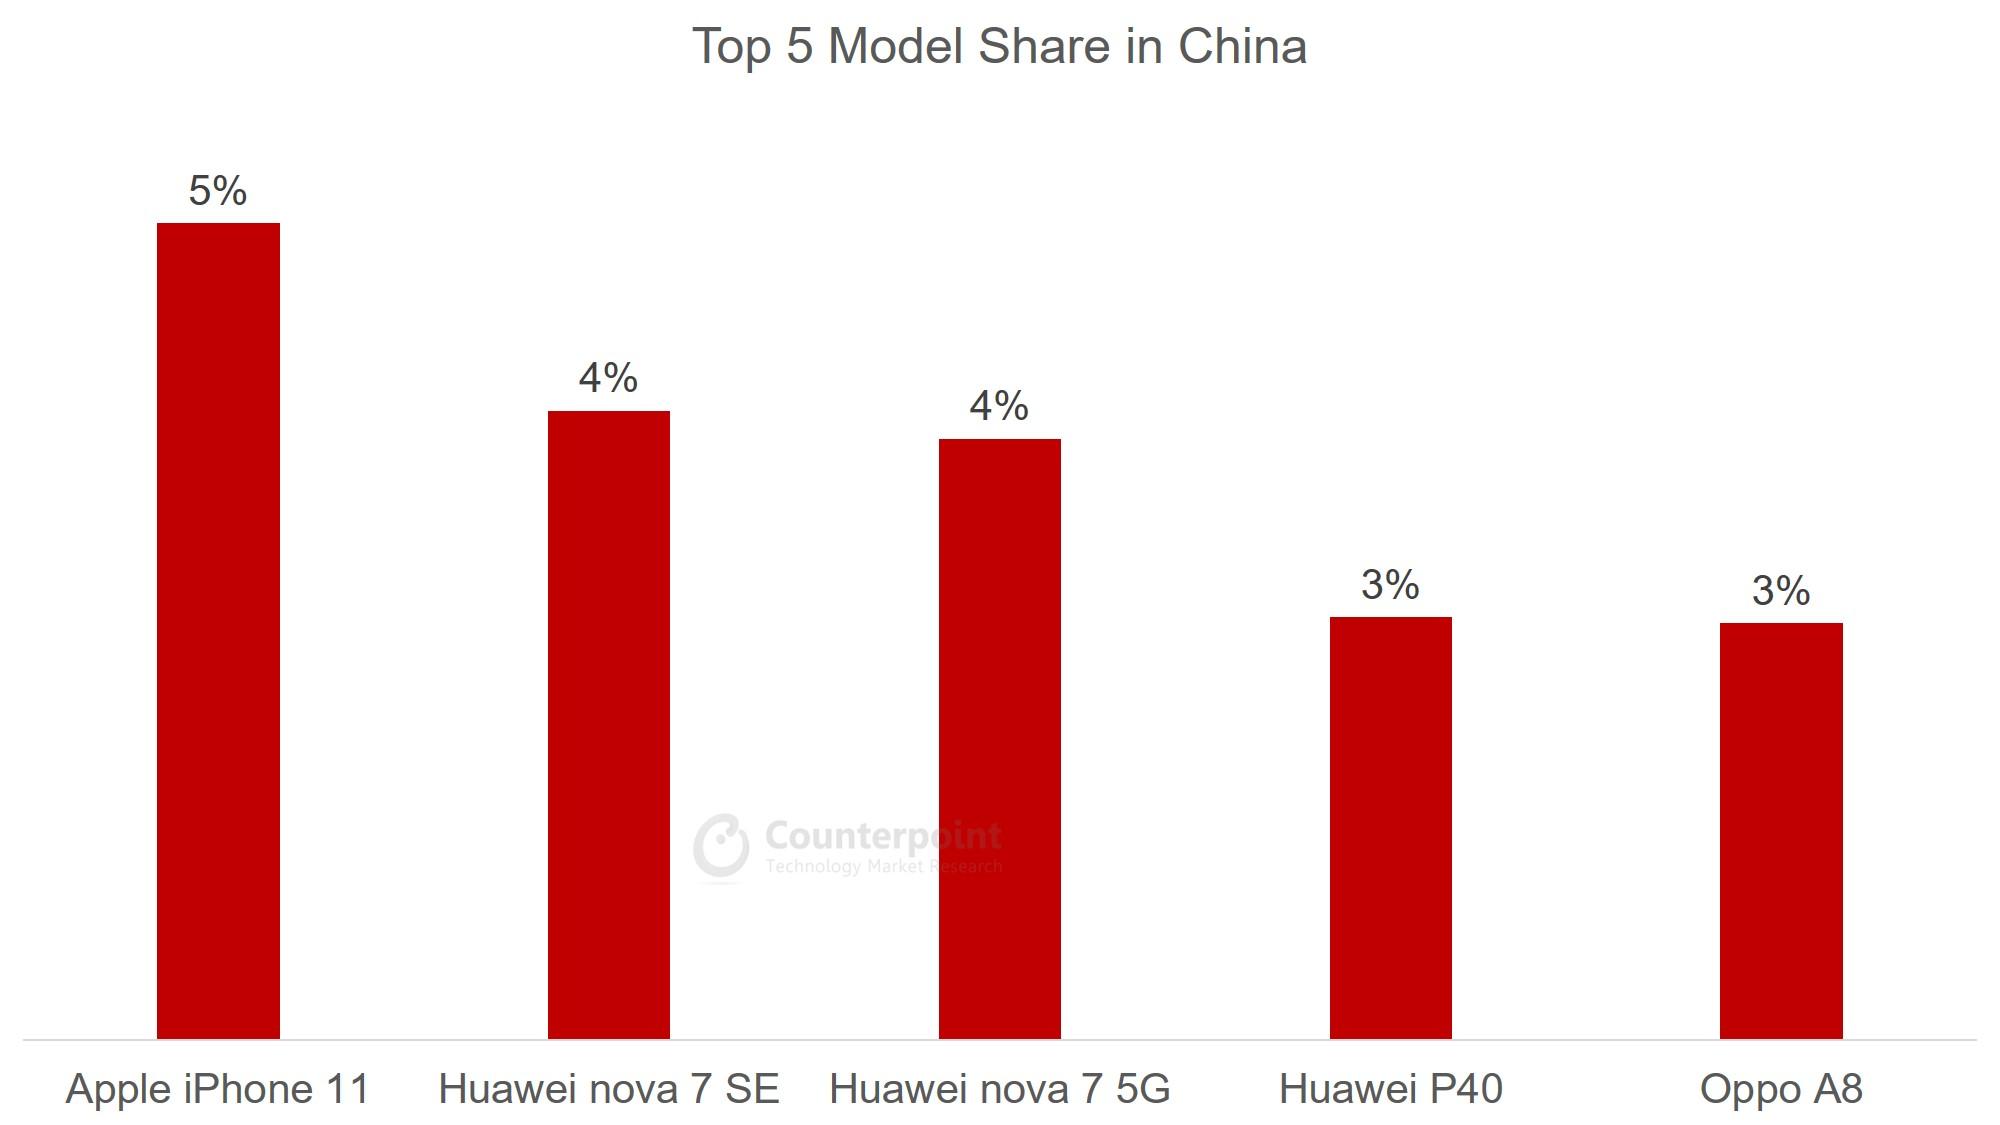 China - Top 5 Model Share - Jul 2020